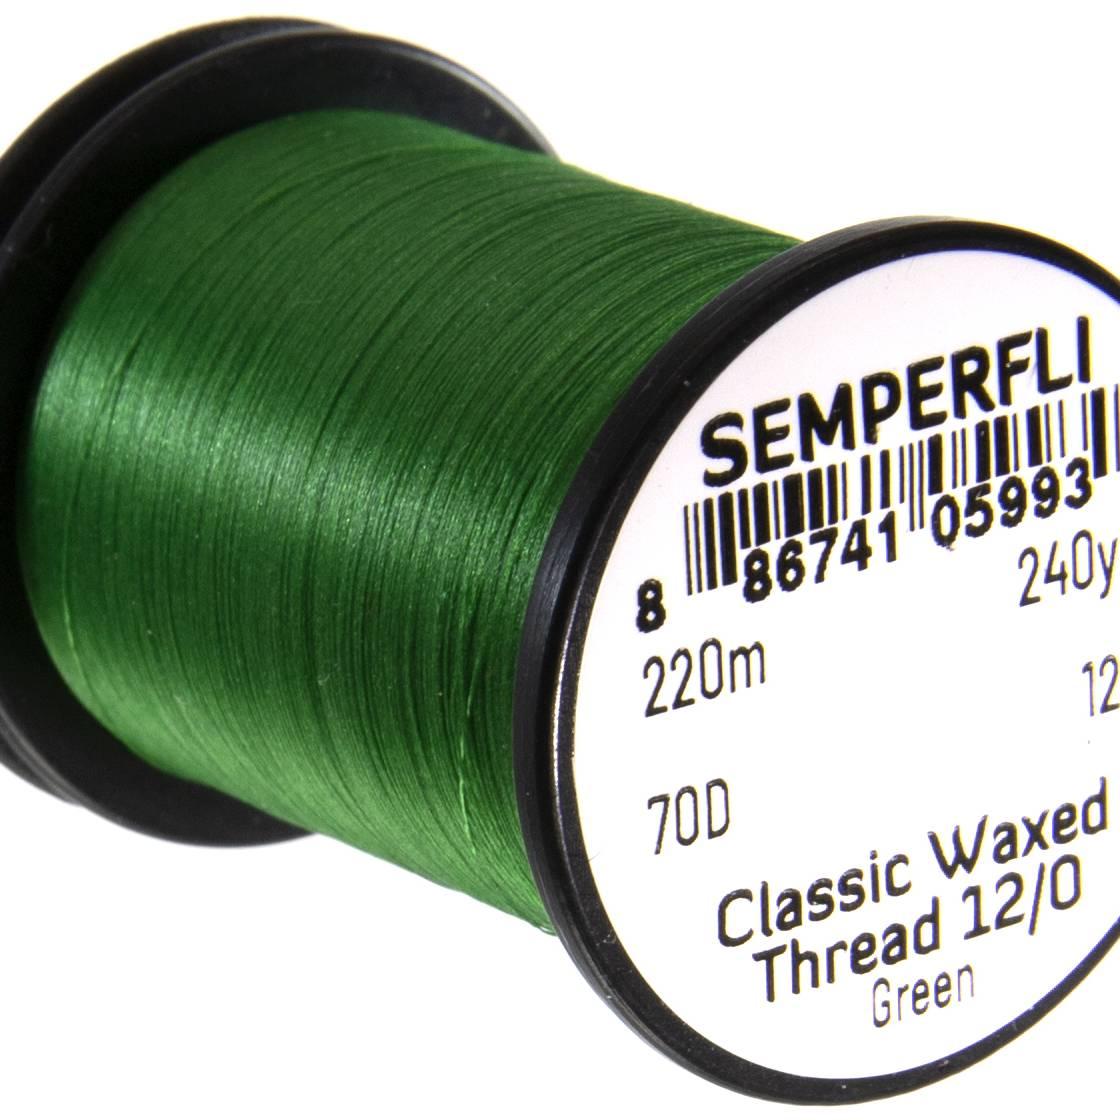 Semperfli Classic Waxed Thread 12/0 240 Yards Green